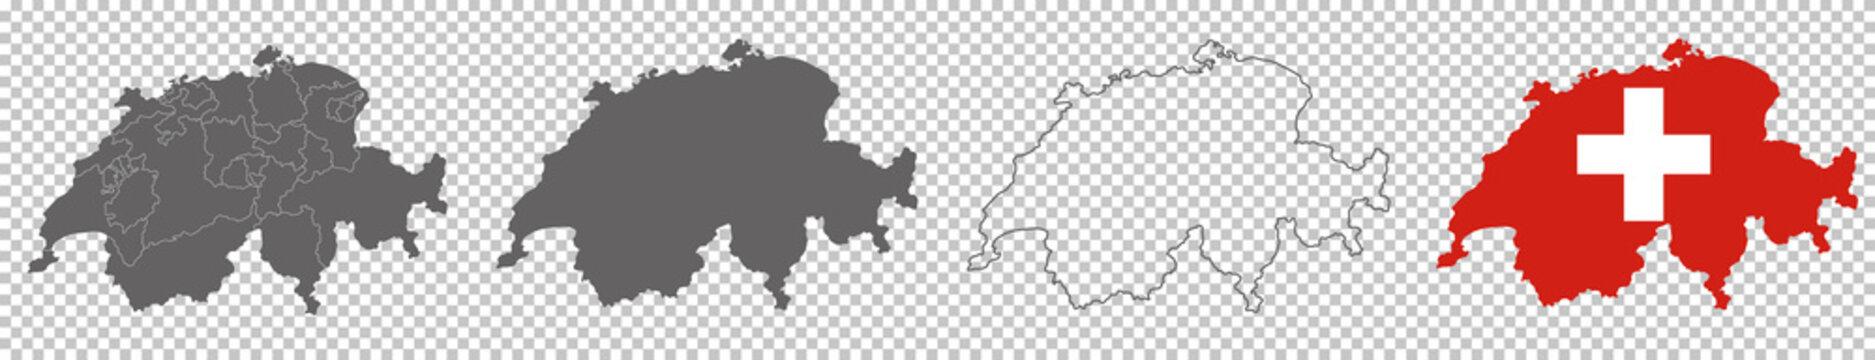 vector map flag of Switzerland isolated on white background